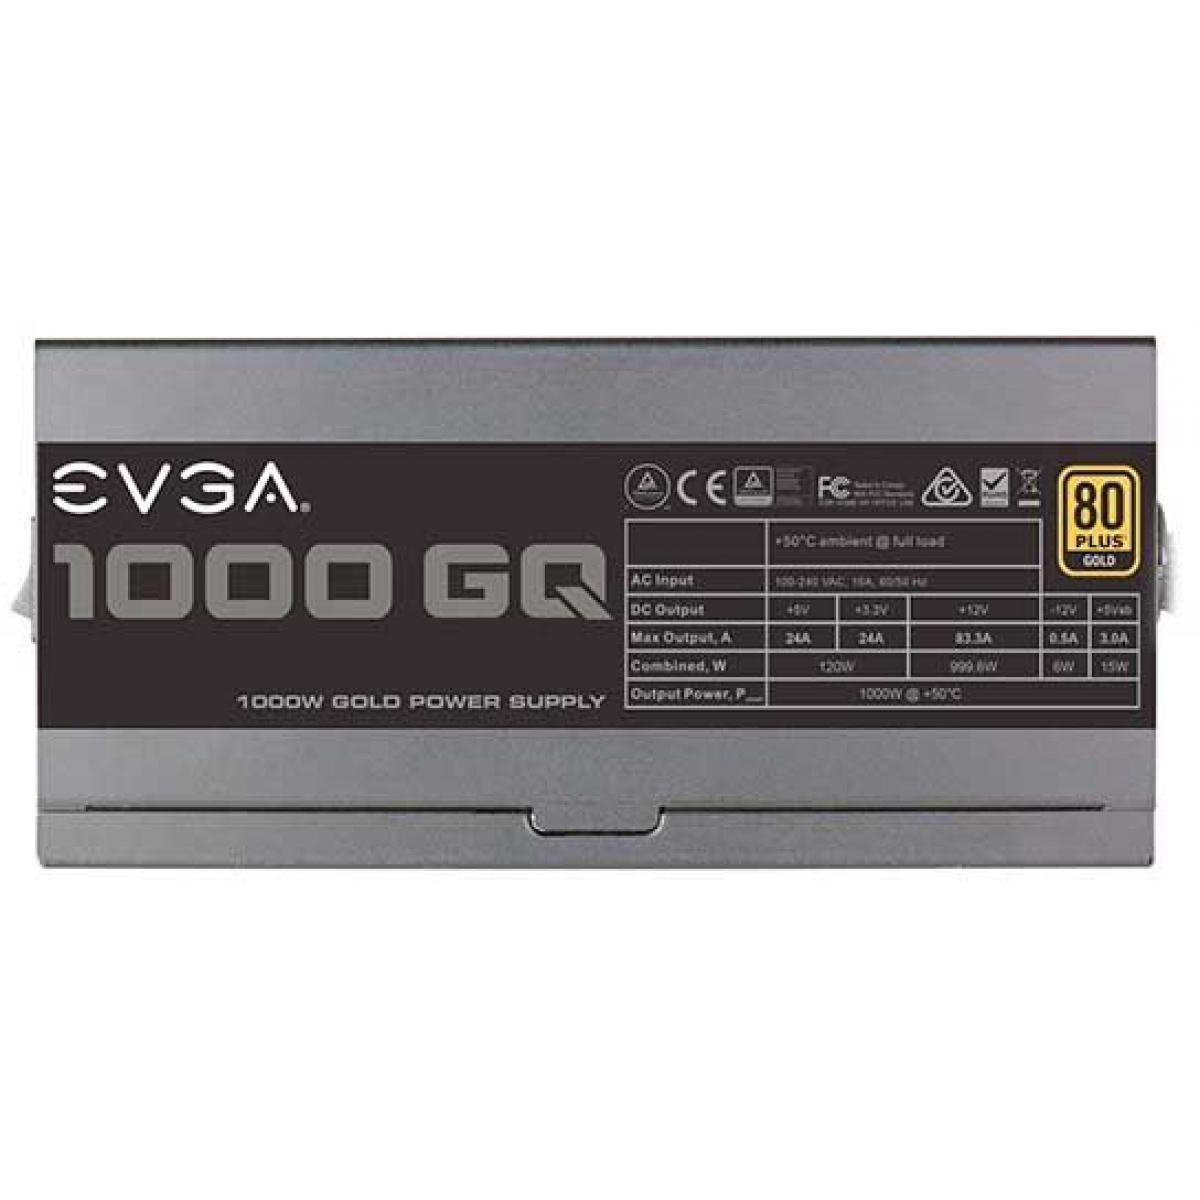 Fonte EVGA 1000 GQ 1000W, 80 Plus Gold, Semi Modular, PFC Ativo, 210-GQ-1000-V